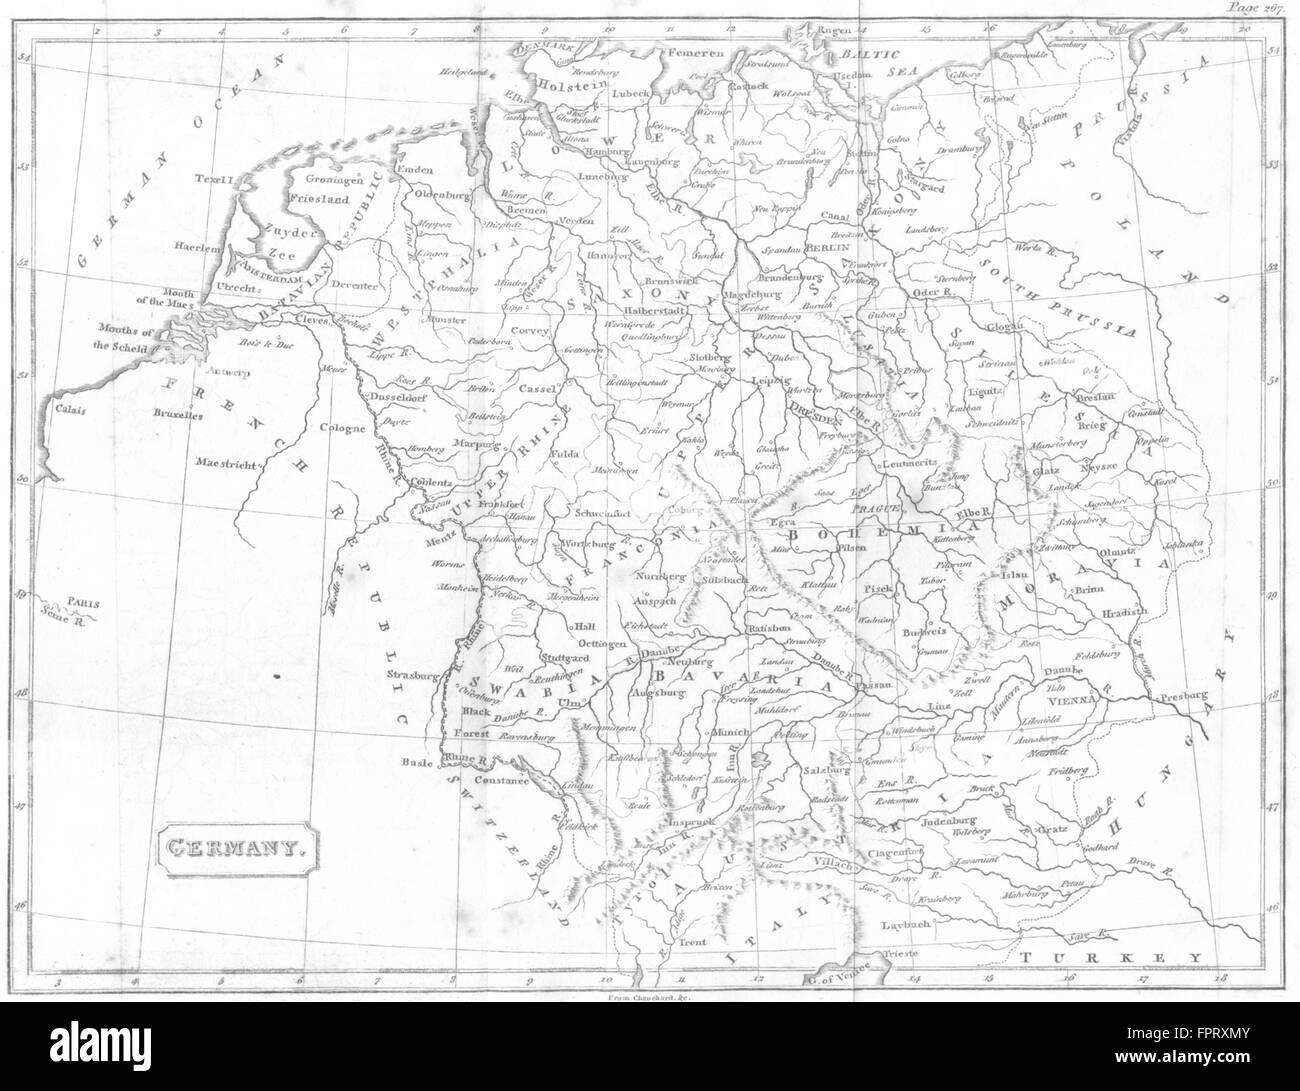 GERMANY: PINKERTON, 1811 antique map - Stock Image